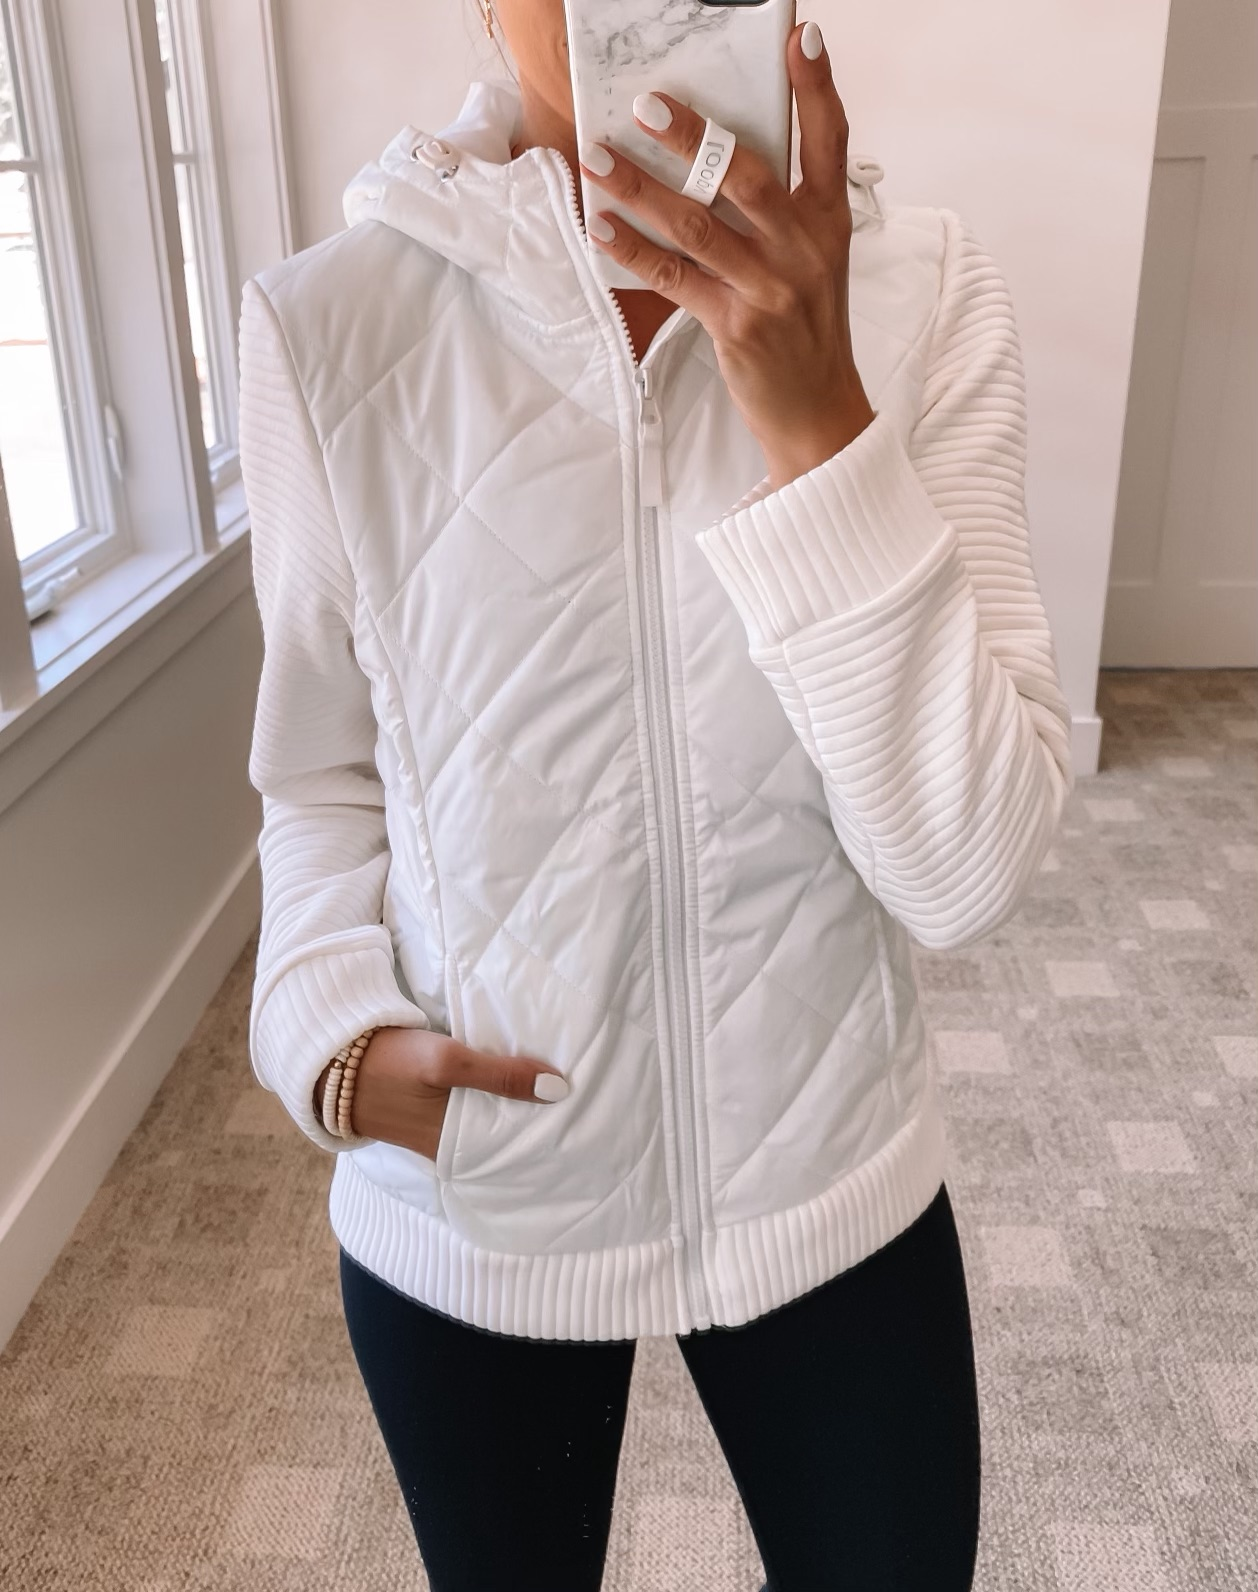 wallmart fall fashion, walmart quilted jacket